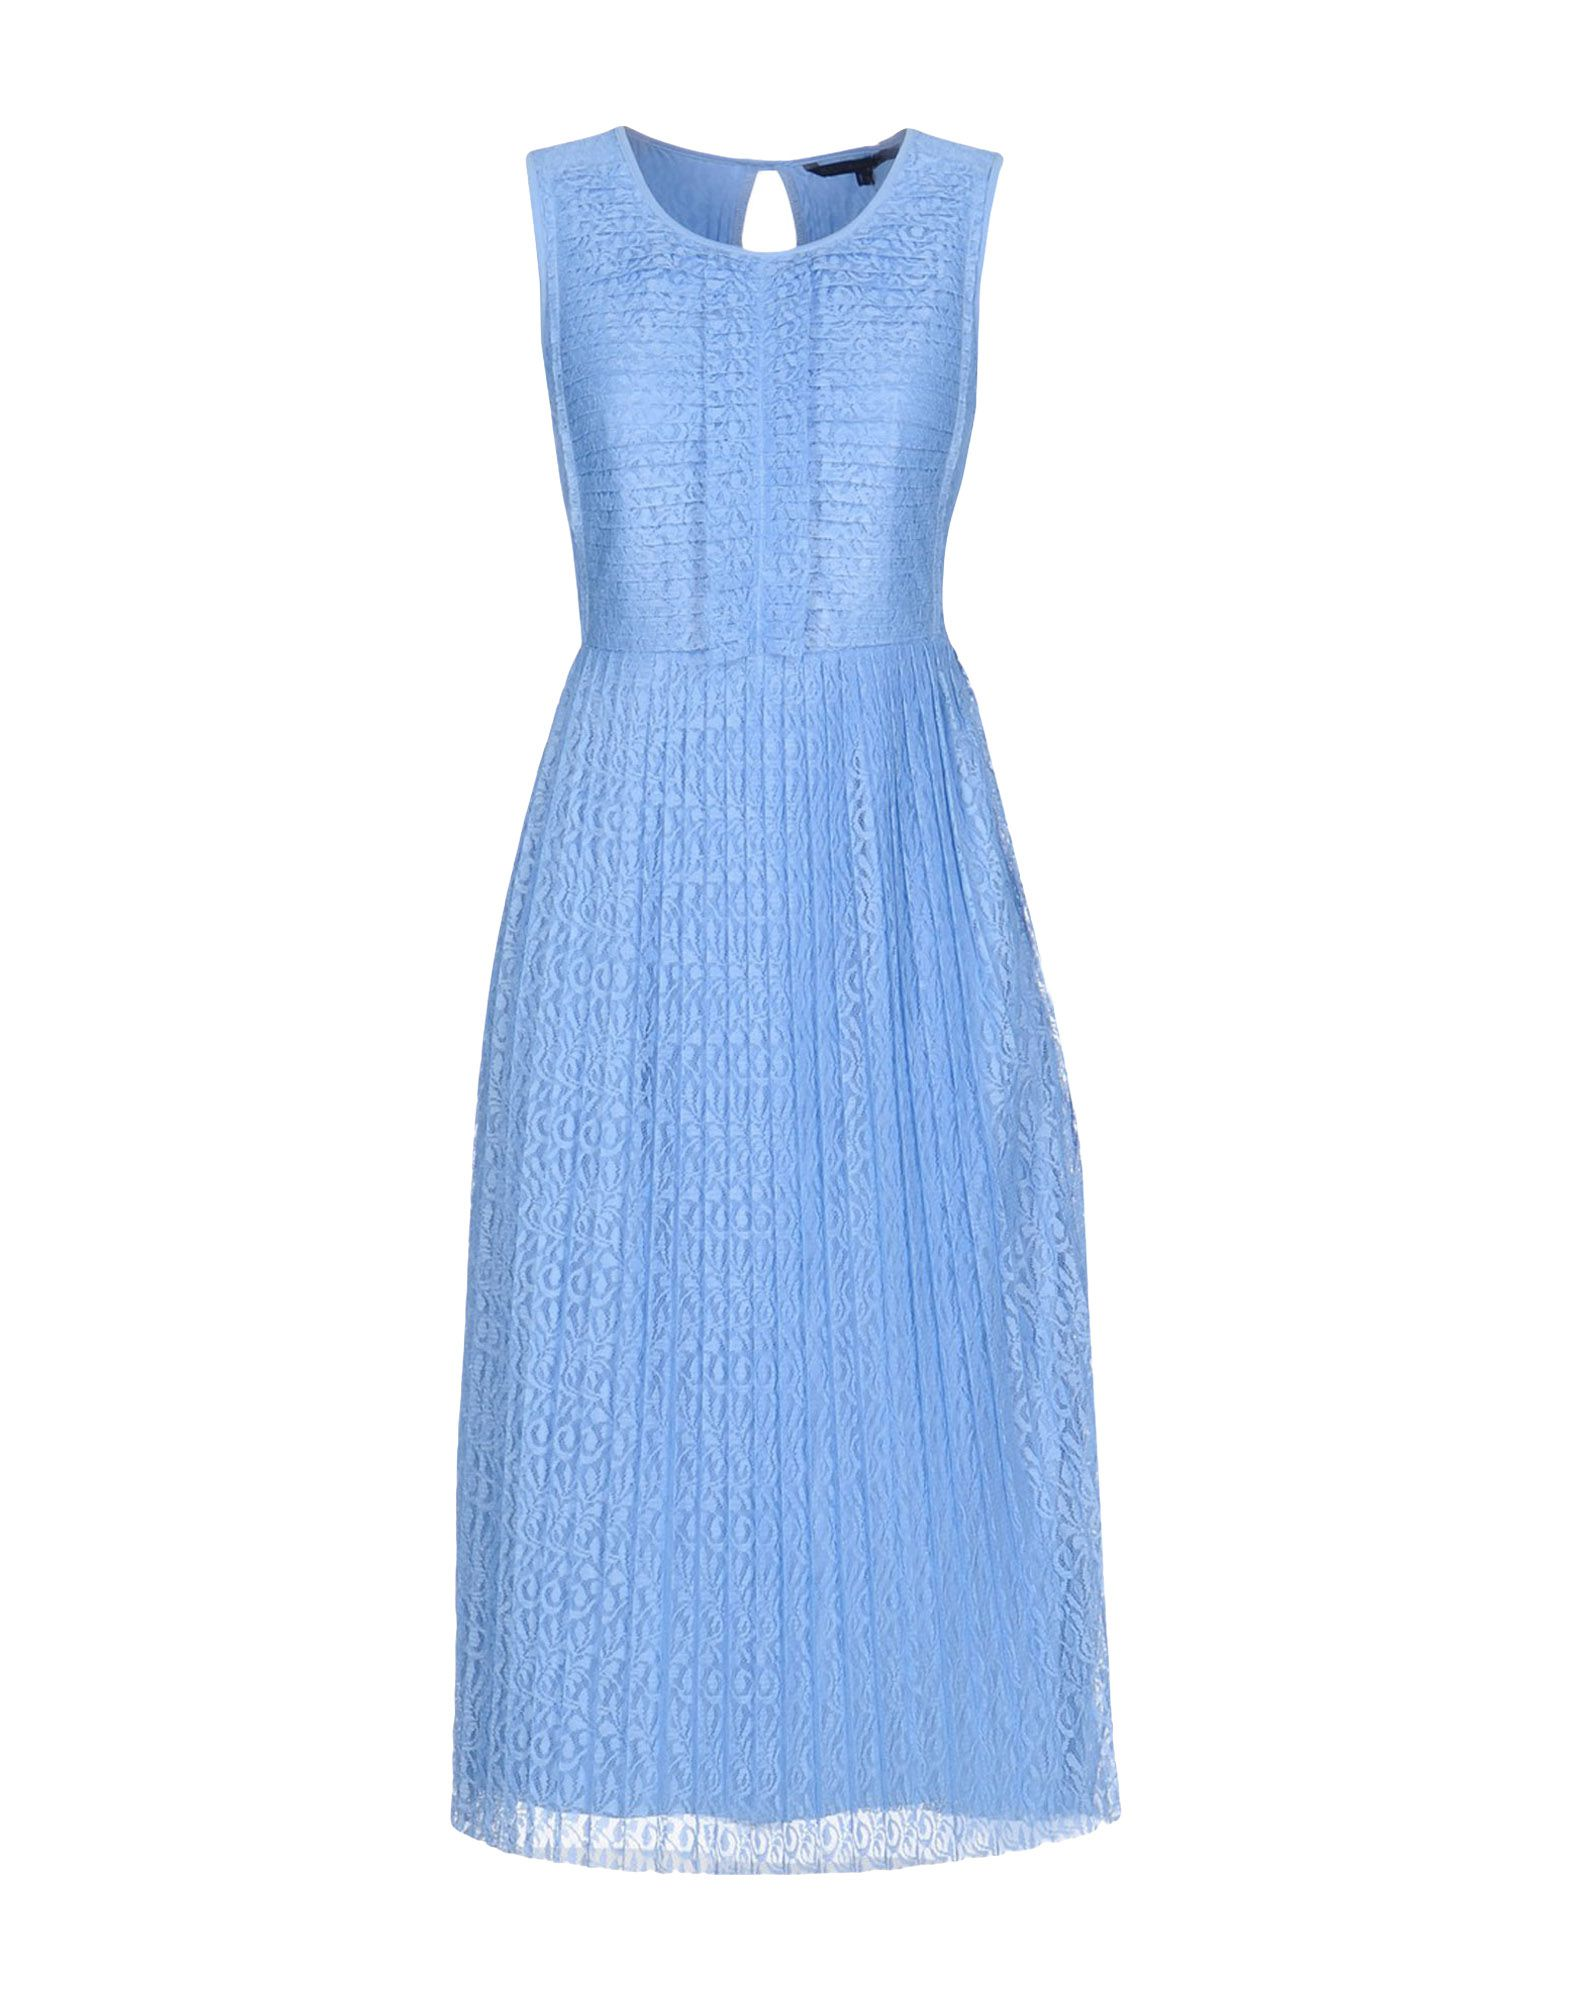 SILVIAN HEACH Damen Knielanges Kleid Farbe Azurblau Größe 6